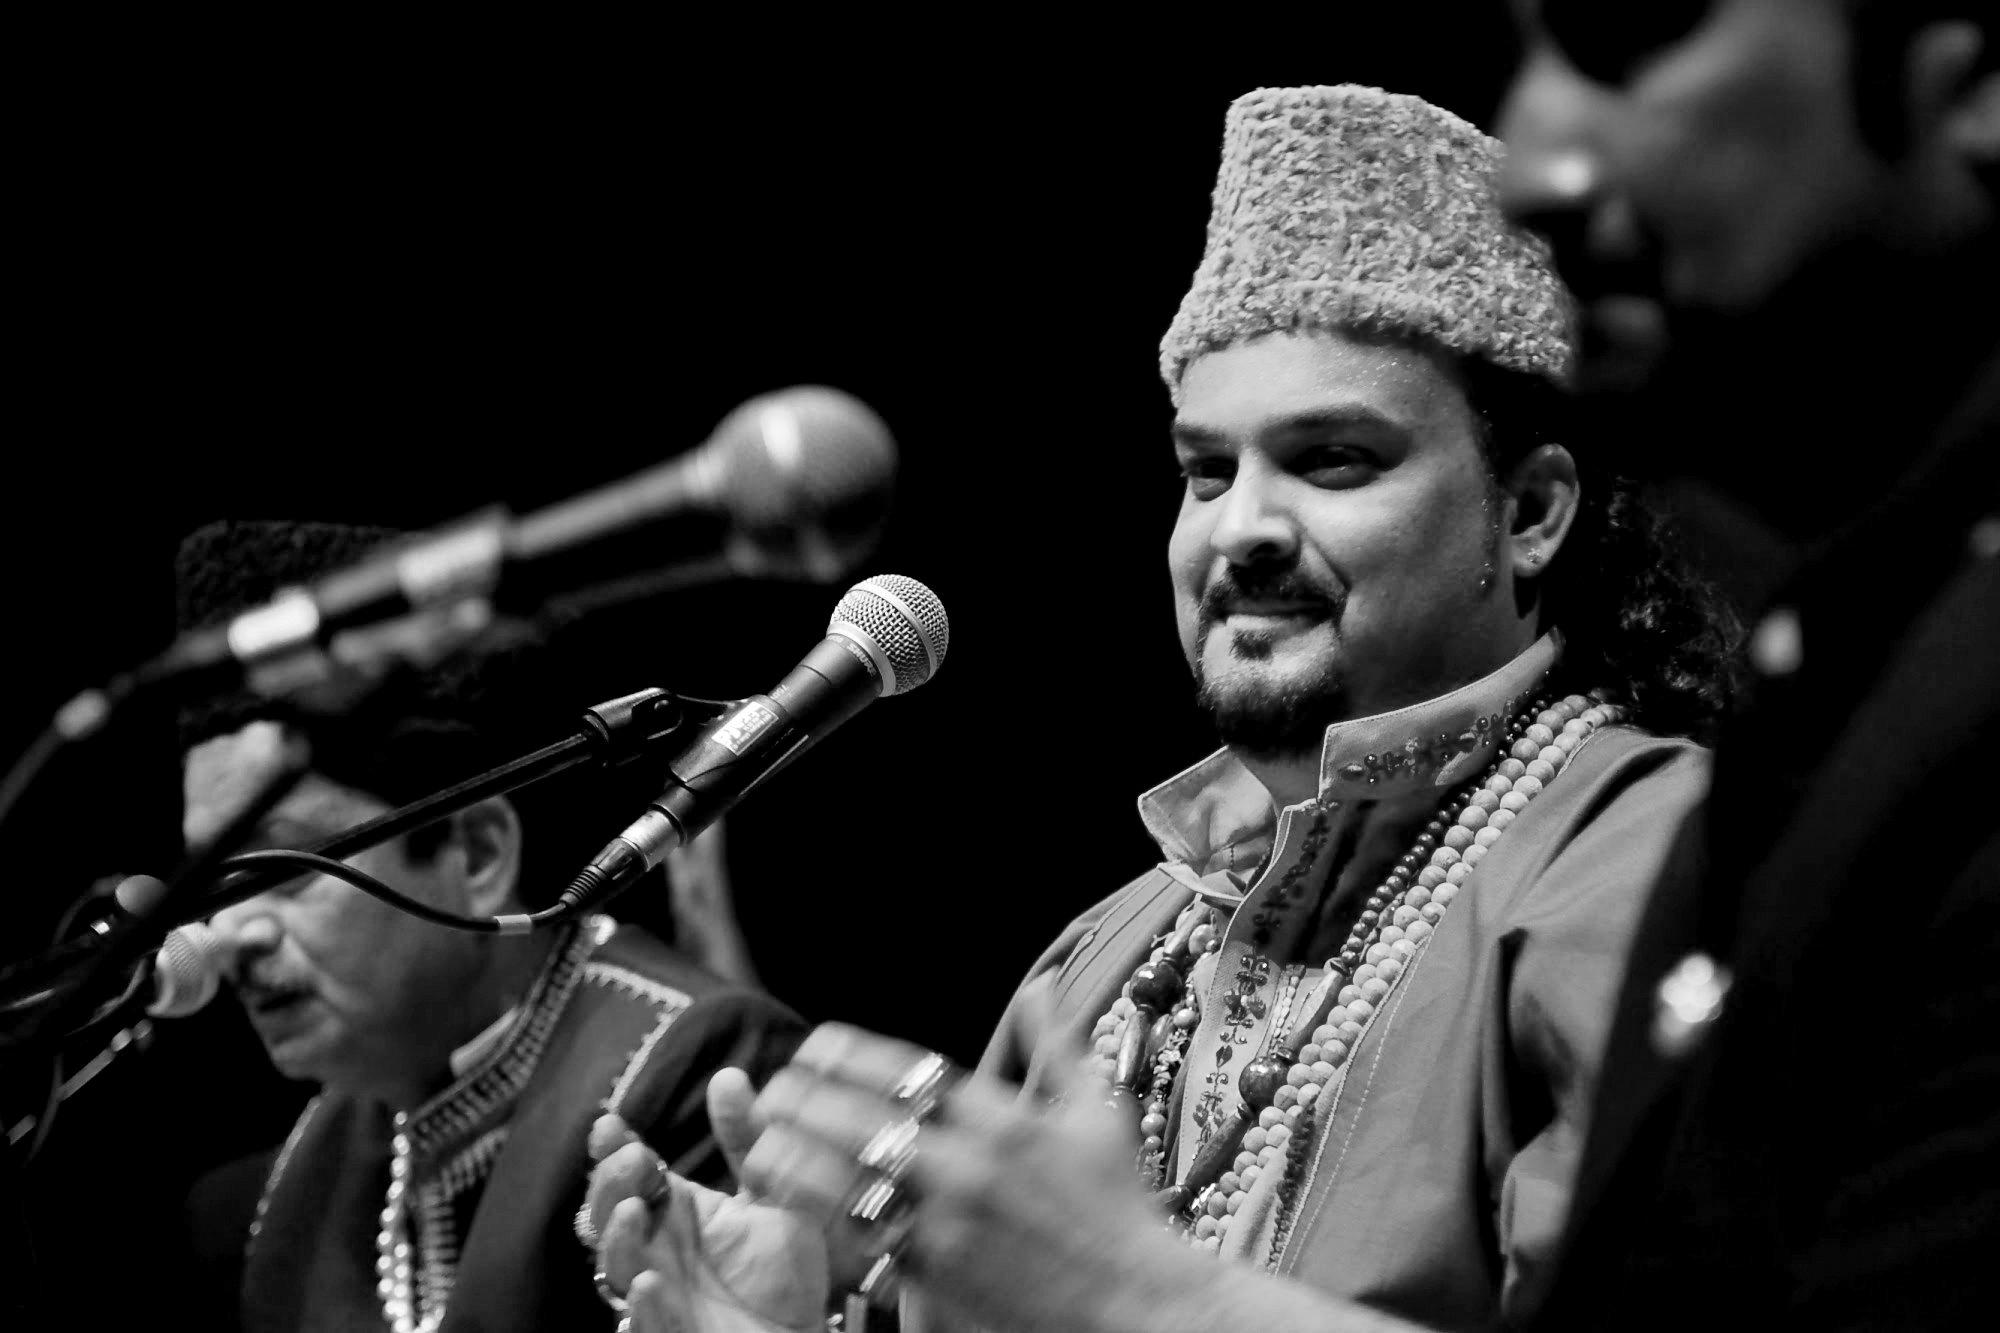 Amjad Sabris son wins hearts with Bhar do Jholi rendition